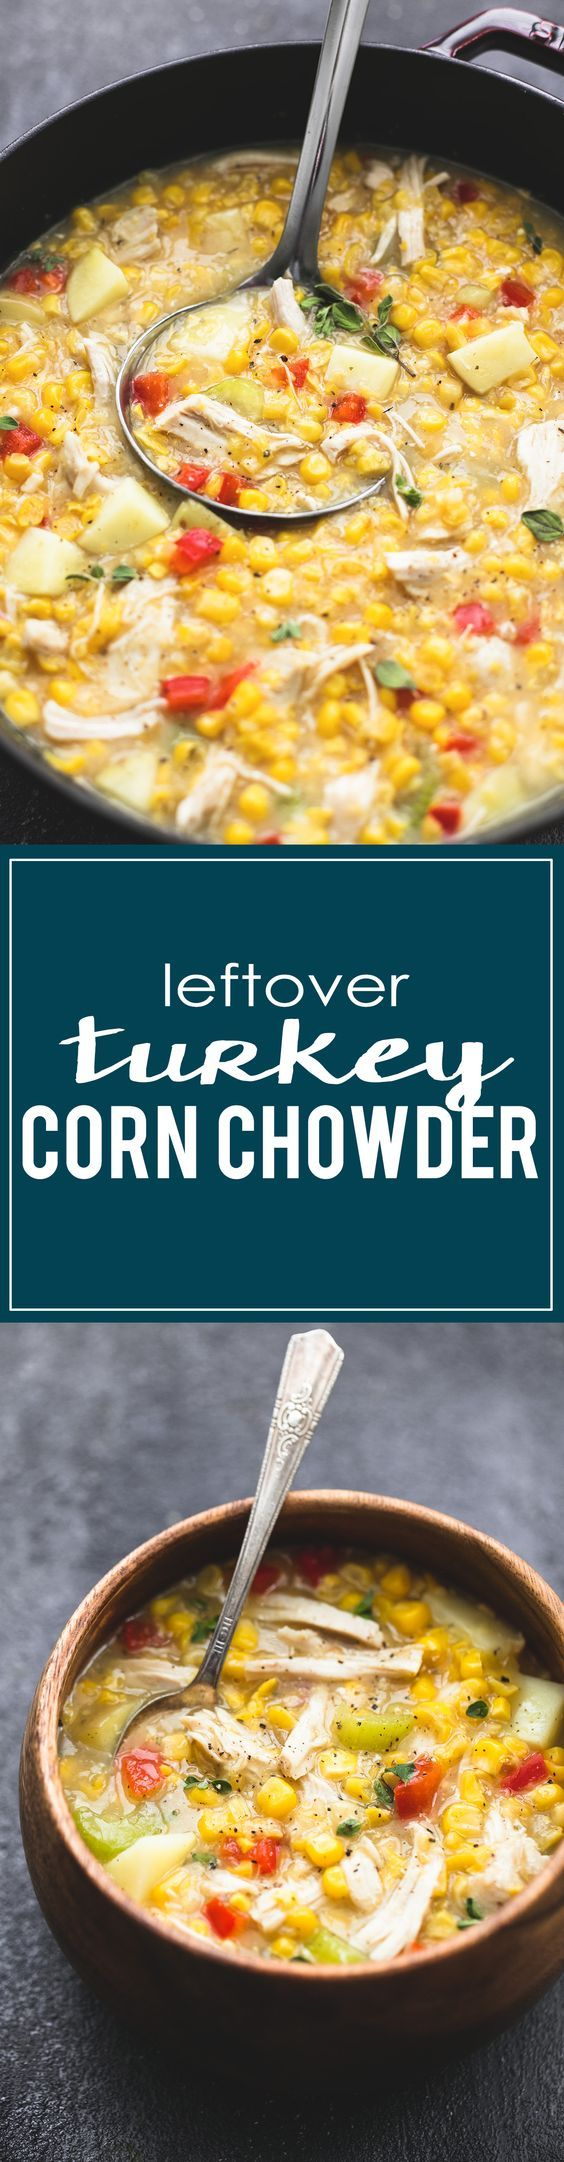 Leftover Turkey (or chicken) Corn Chowder | lecremedelacrumb.com